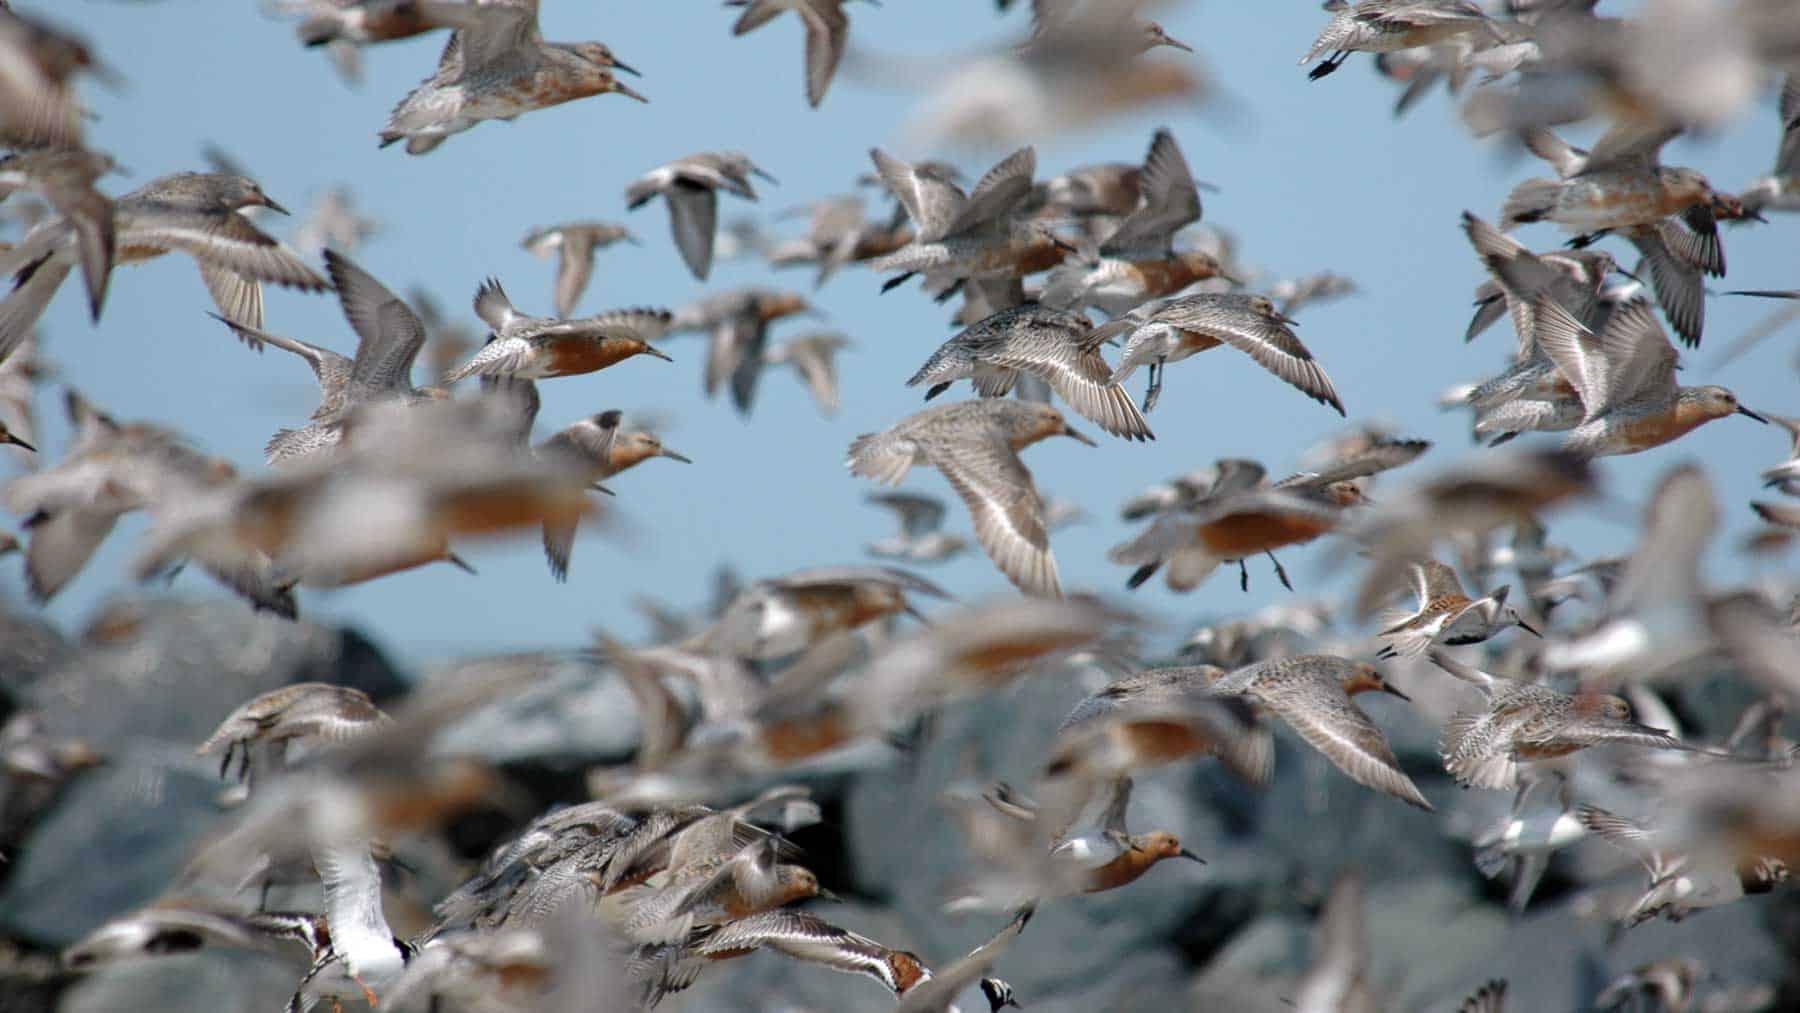 Flock of Red Knots in flight